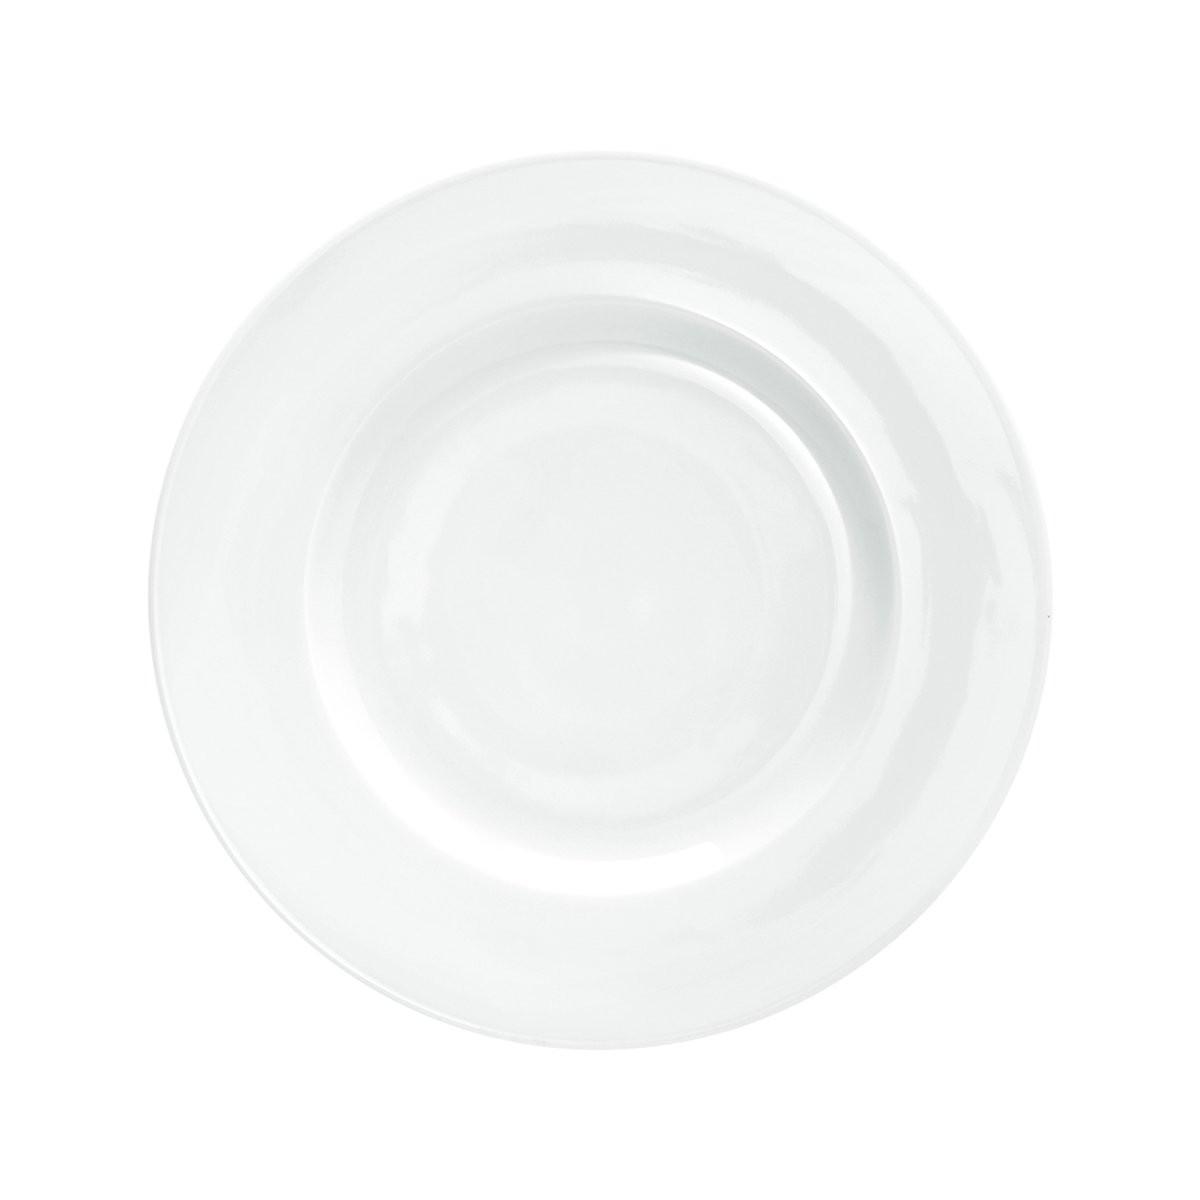 PURO Dezertní talíř classic 23 cm